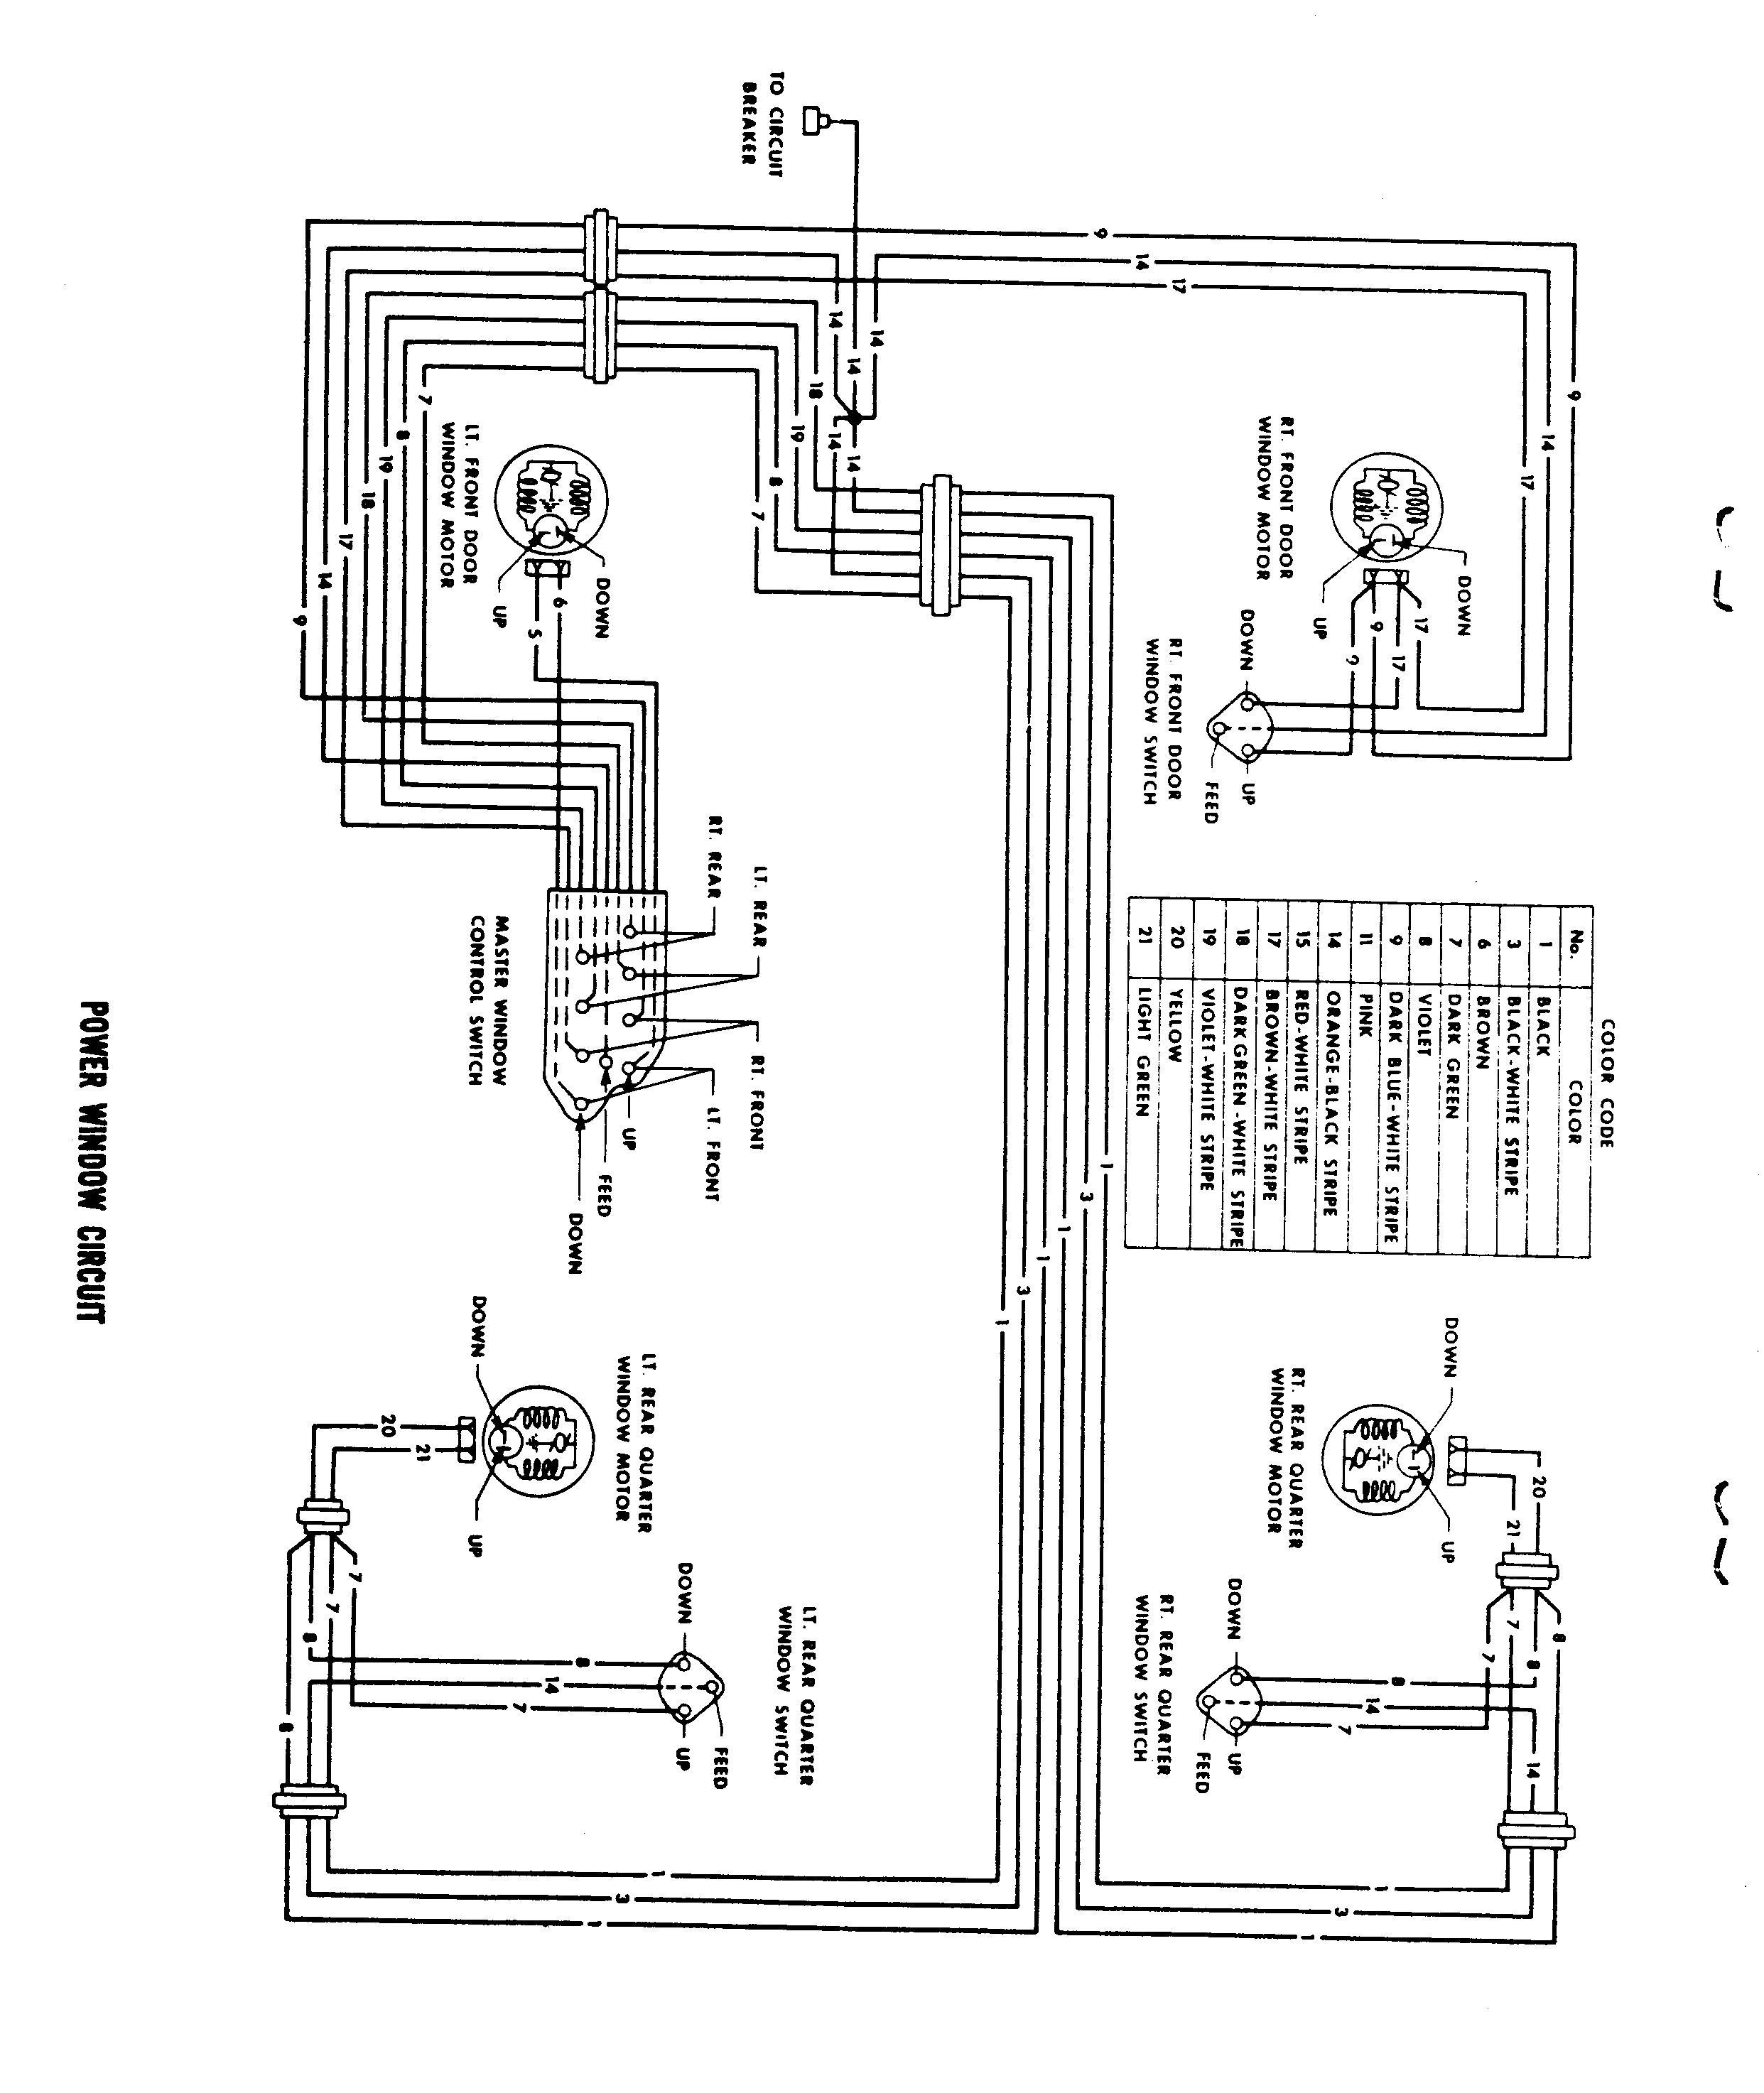 Vehicle Parts & Accessories PONTIAC 1970 Tempest & GTO